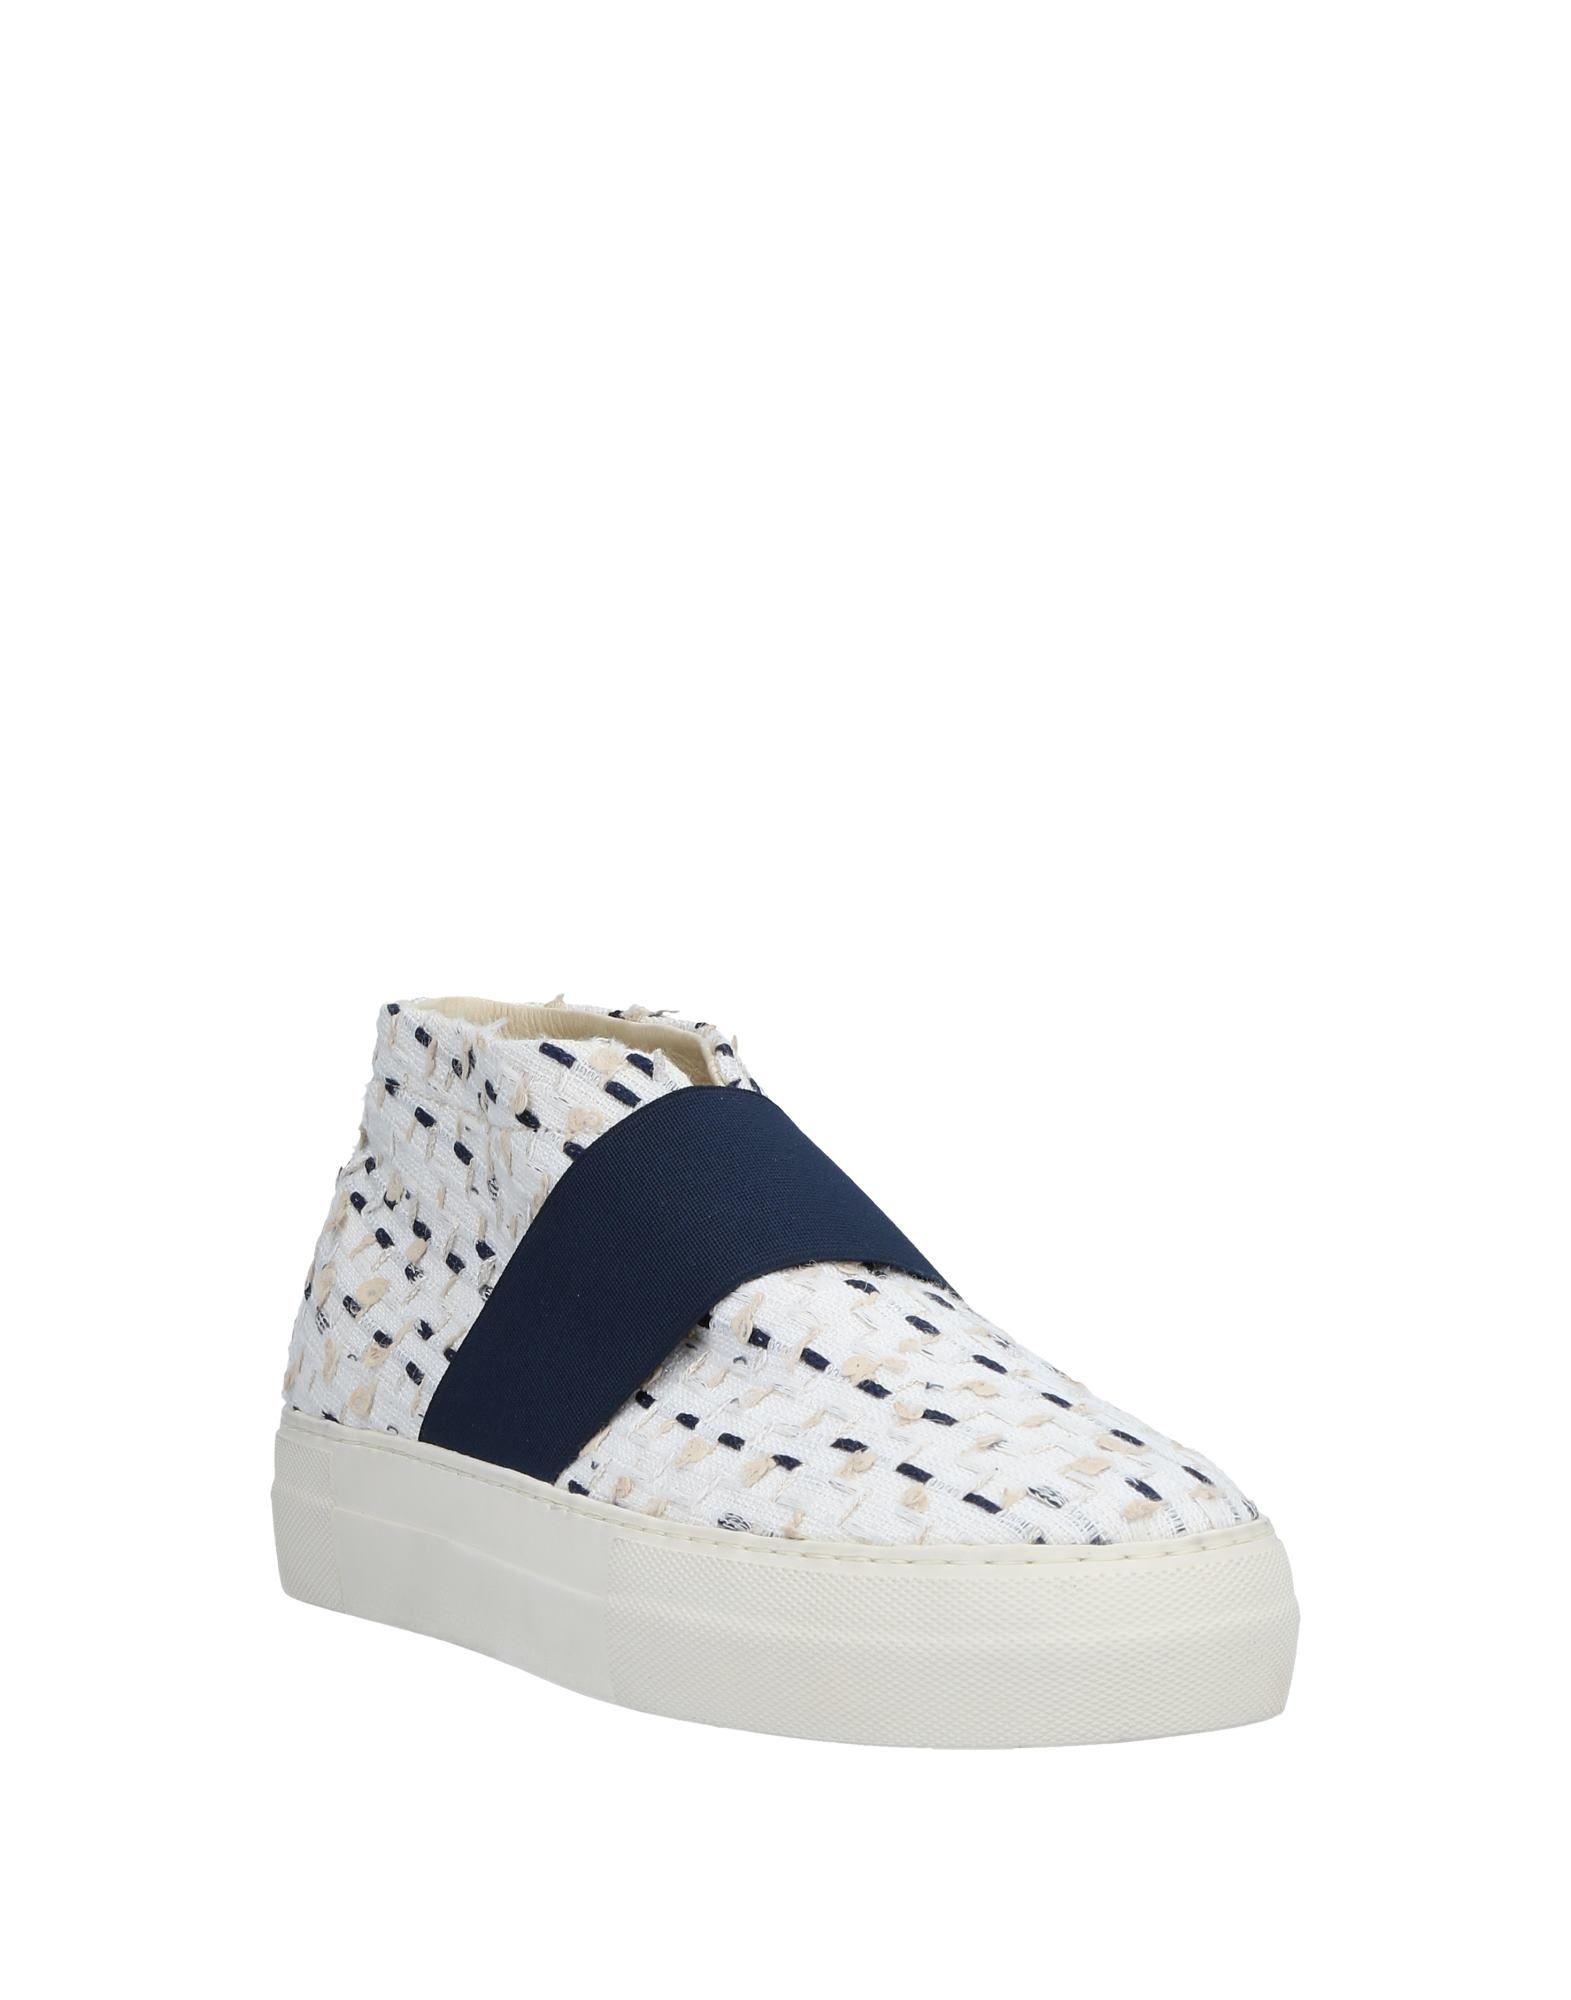 Sneakers Diemme Donna elegante - 11500848TW elegante Donna b5ea3d